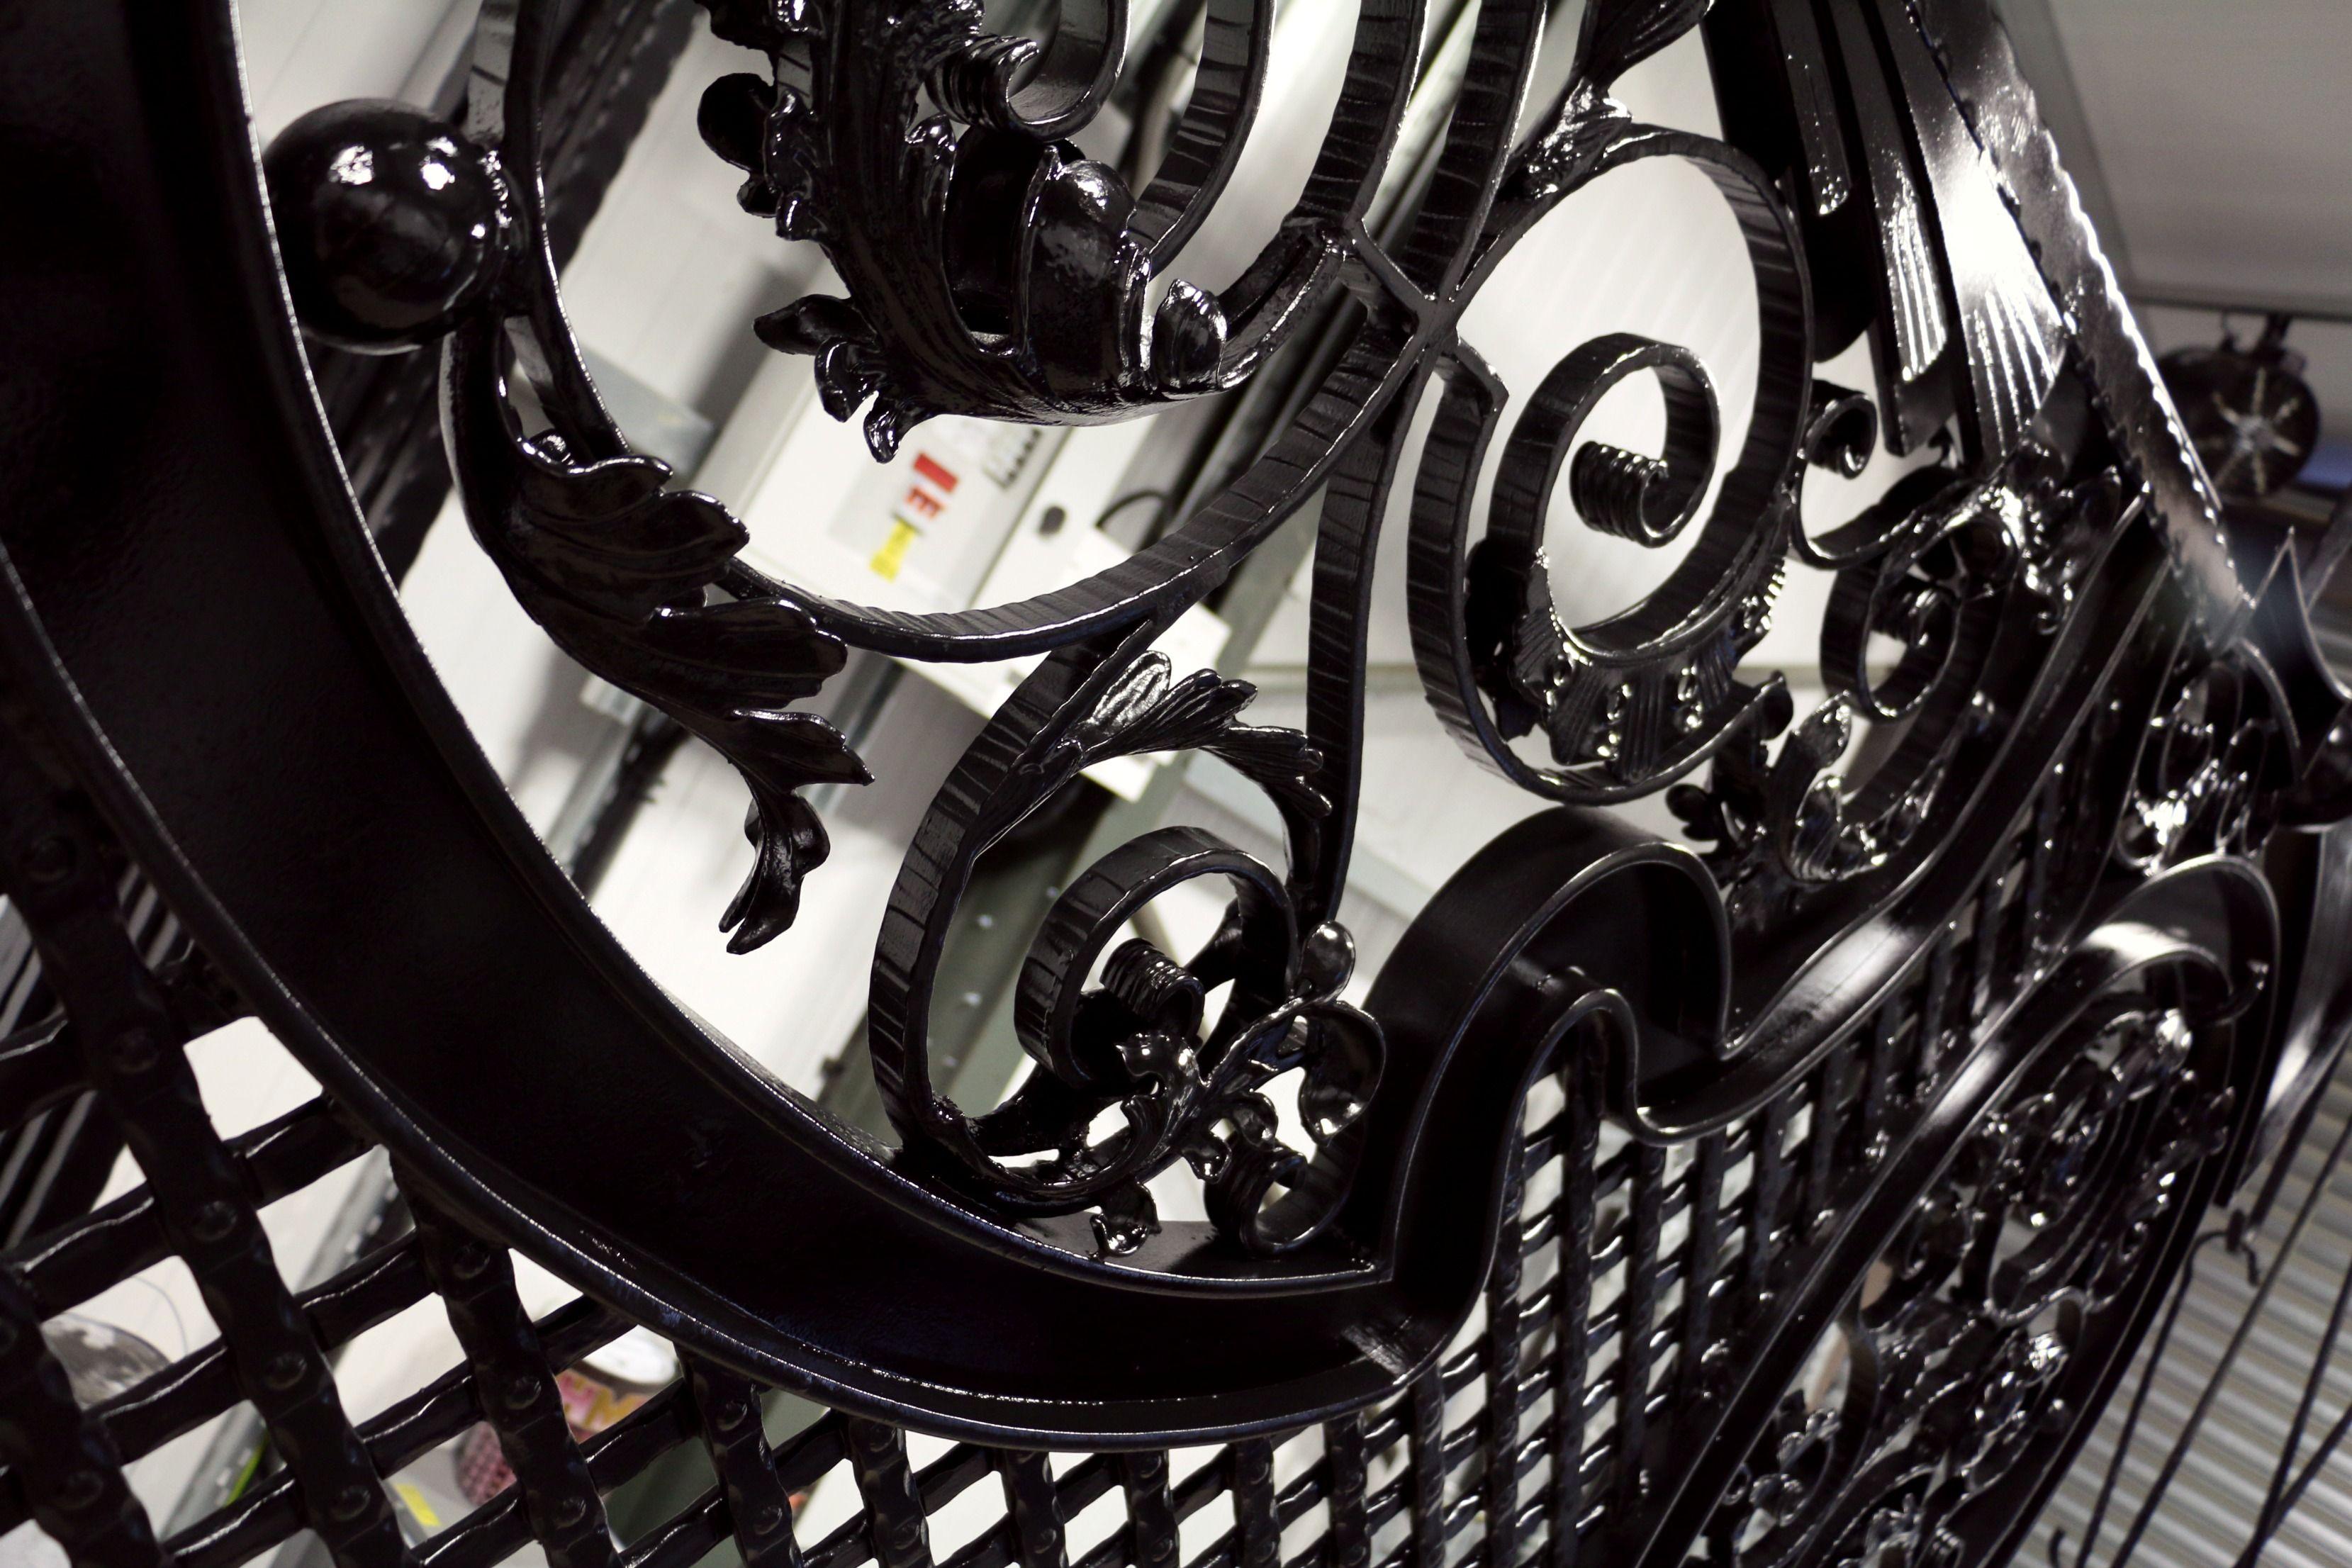 #WroughtIron #Iron #DrivewayGates #Metal #EstateGates #Drive #Garden #Bespoke #Custom #Designer #Modern #Vintage #Contemporary #Entrance #Sliding #Architecture #Privacy #Entry #Victorian #Outdoor #Traditional #Gates #Paint #Black #Shine